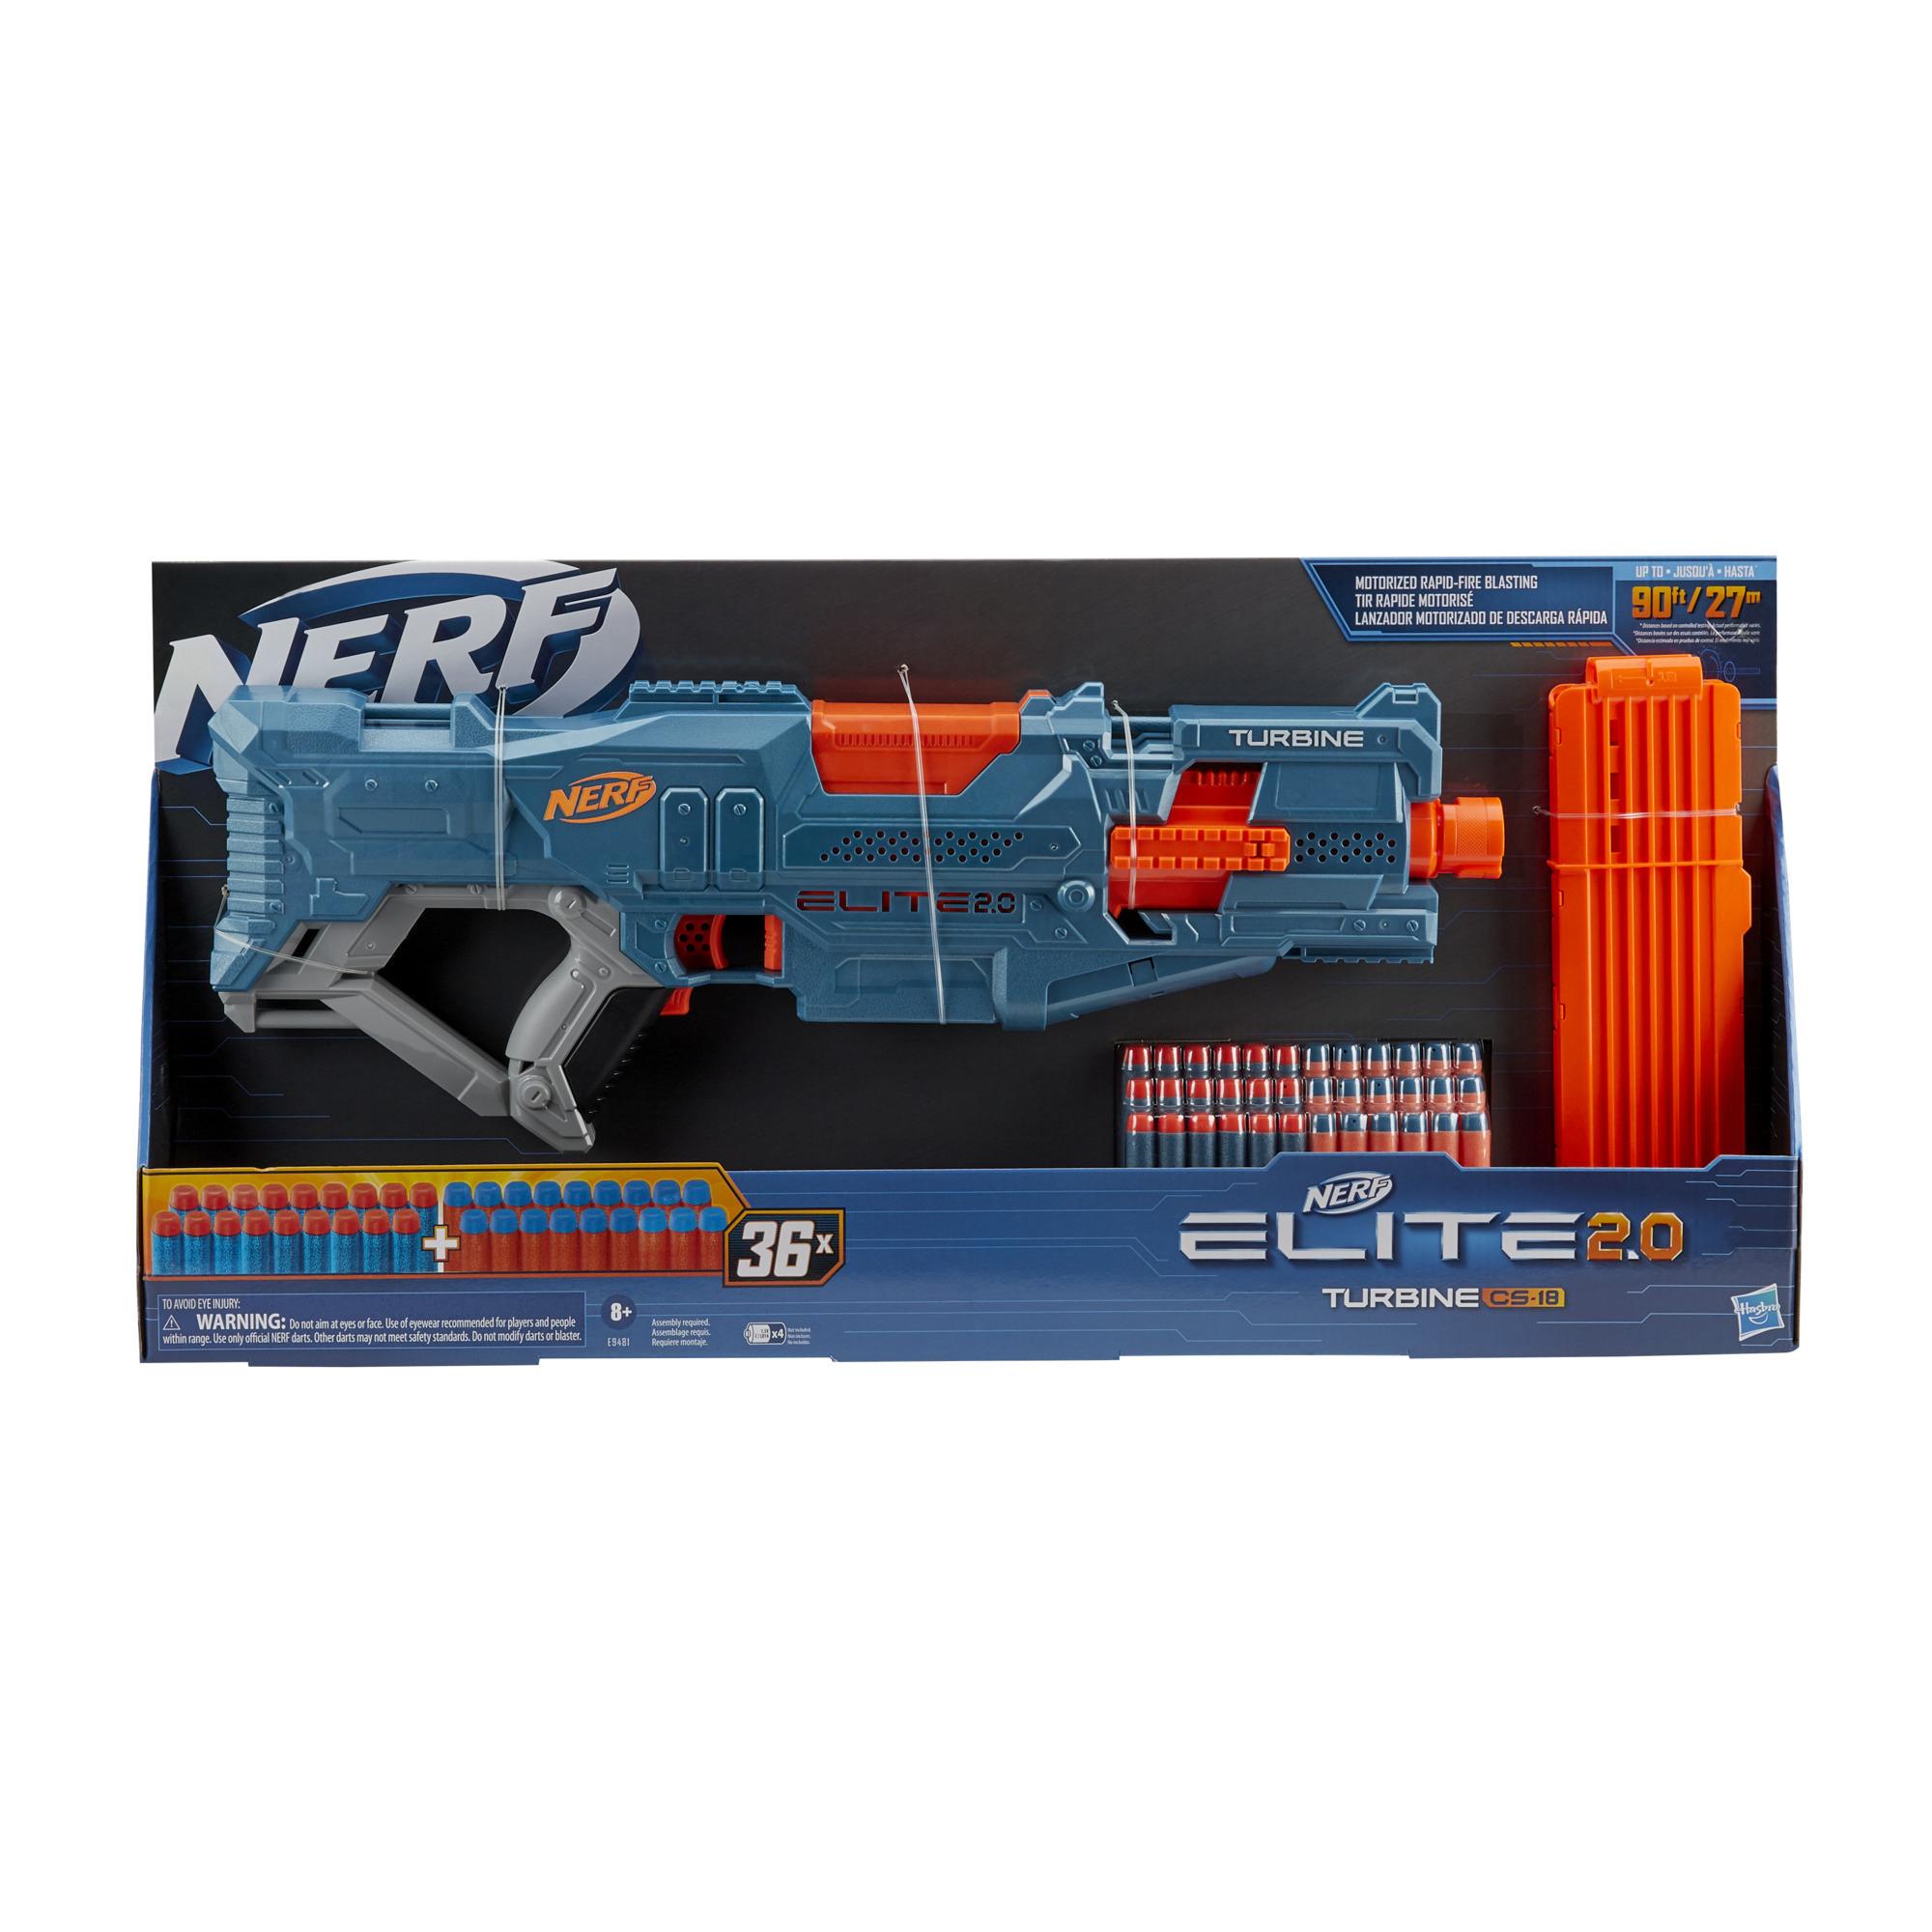 Nerf Elite 2.0 Turbine CS-18 Μηχανοκίνητος εκτοξευτής, 36 επίσημα βελάκια Nerf, Γεμιστήρας για 18 βελάκια, Ενσωματωμένες δυνατότητες εξατομίκευσης